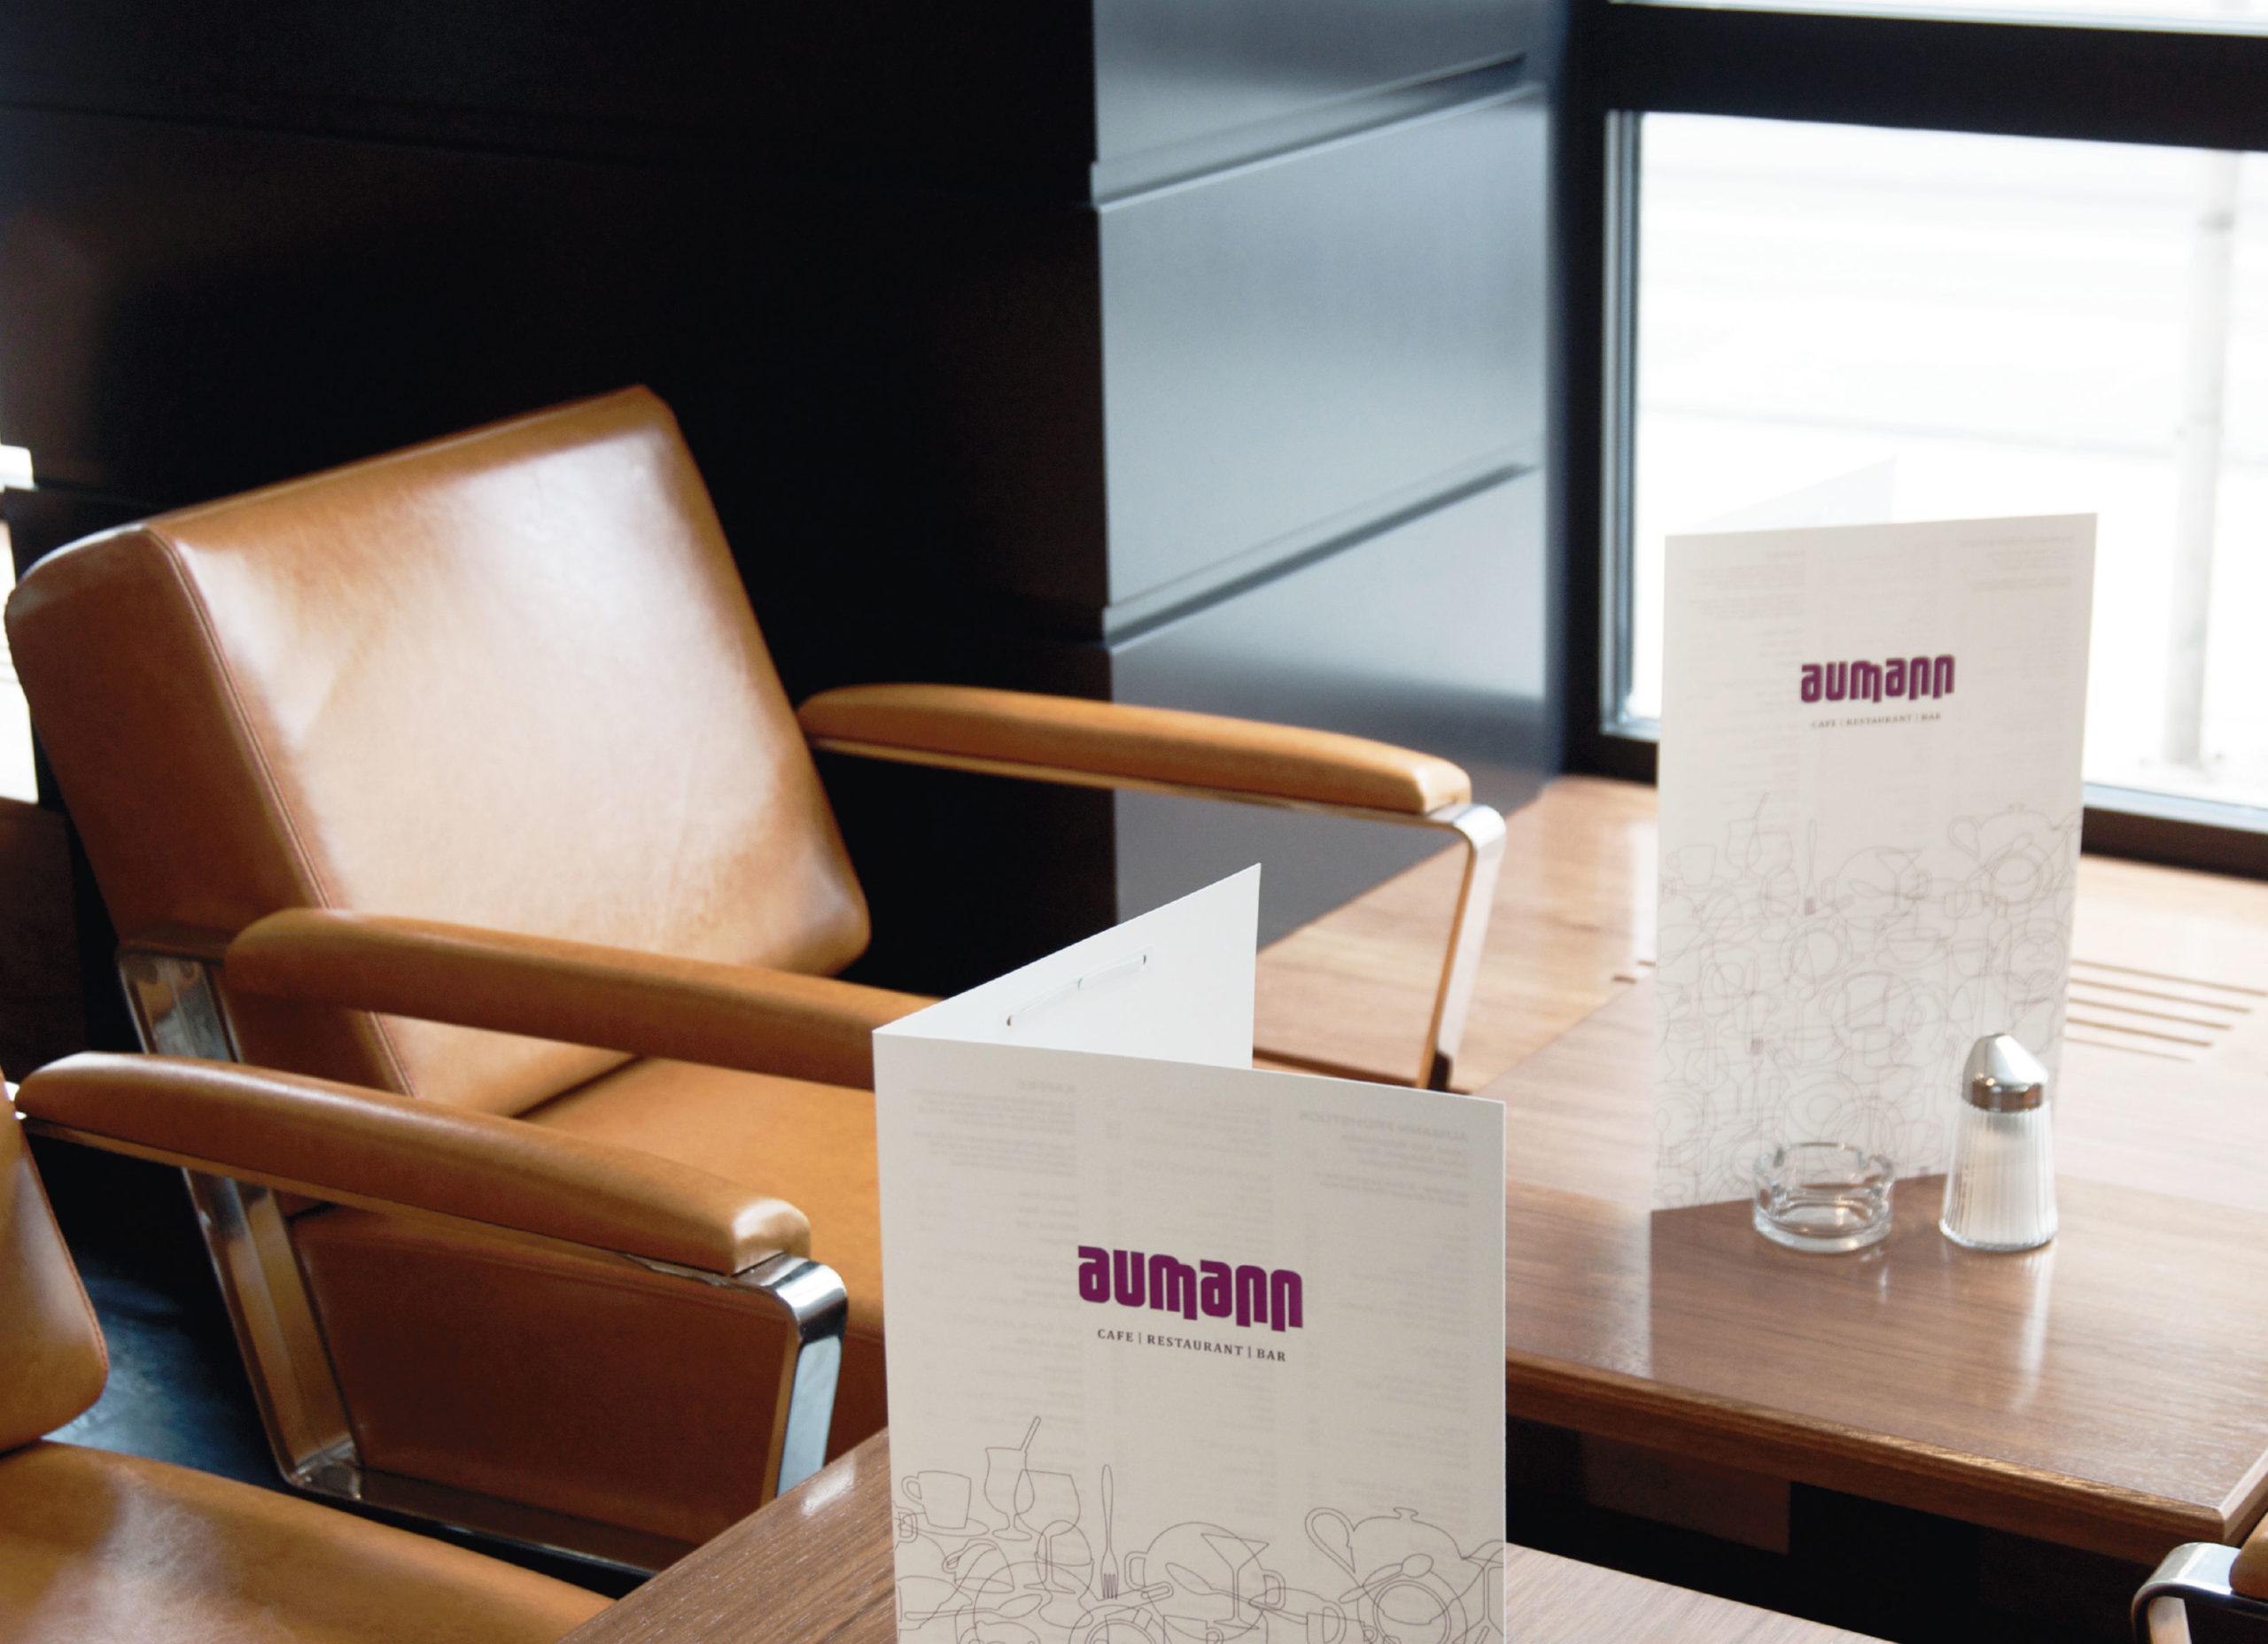 DASUNO - Nora Sri Jascha // Client: Aumann // 2011